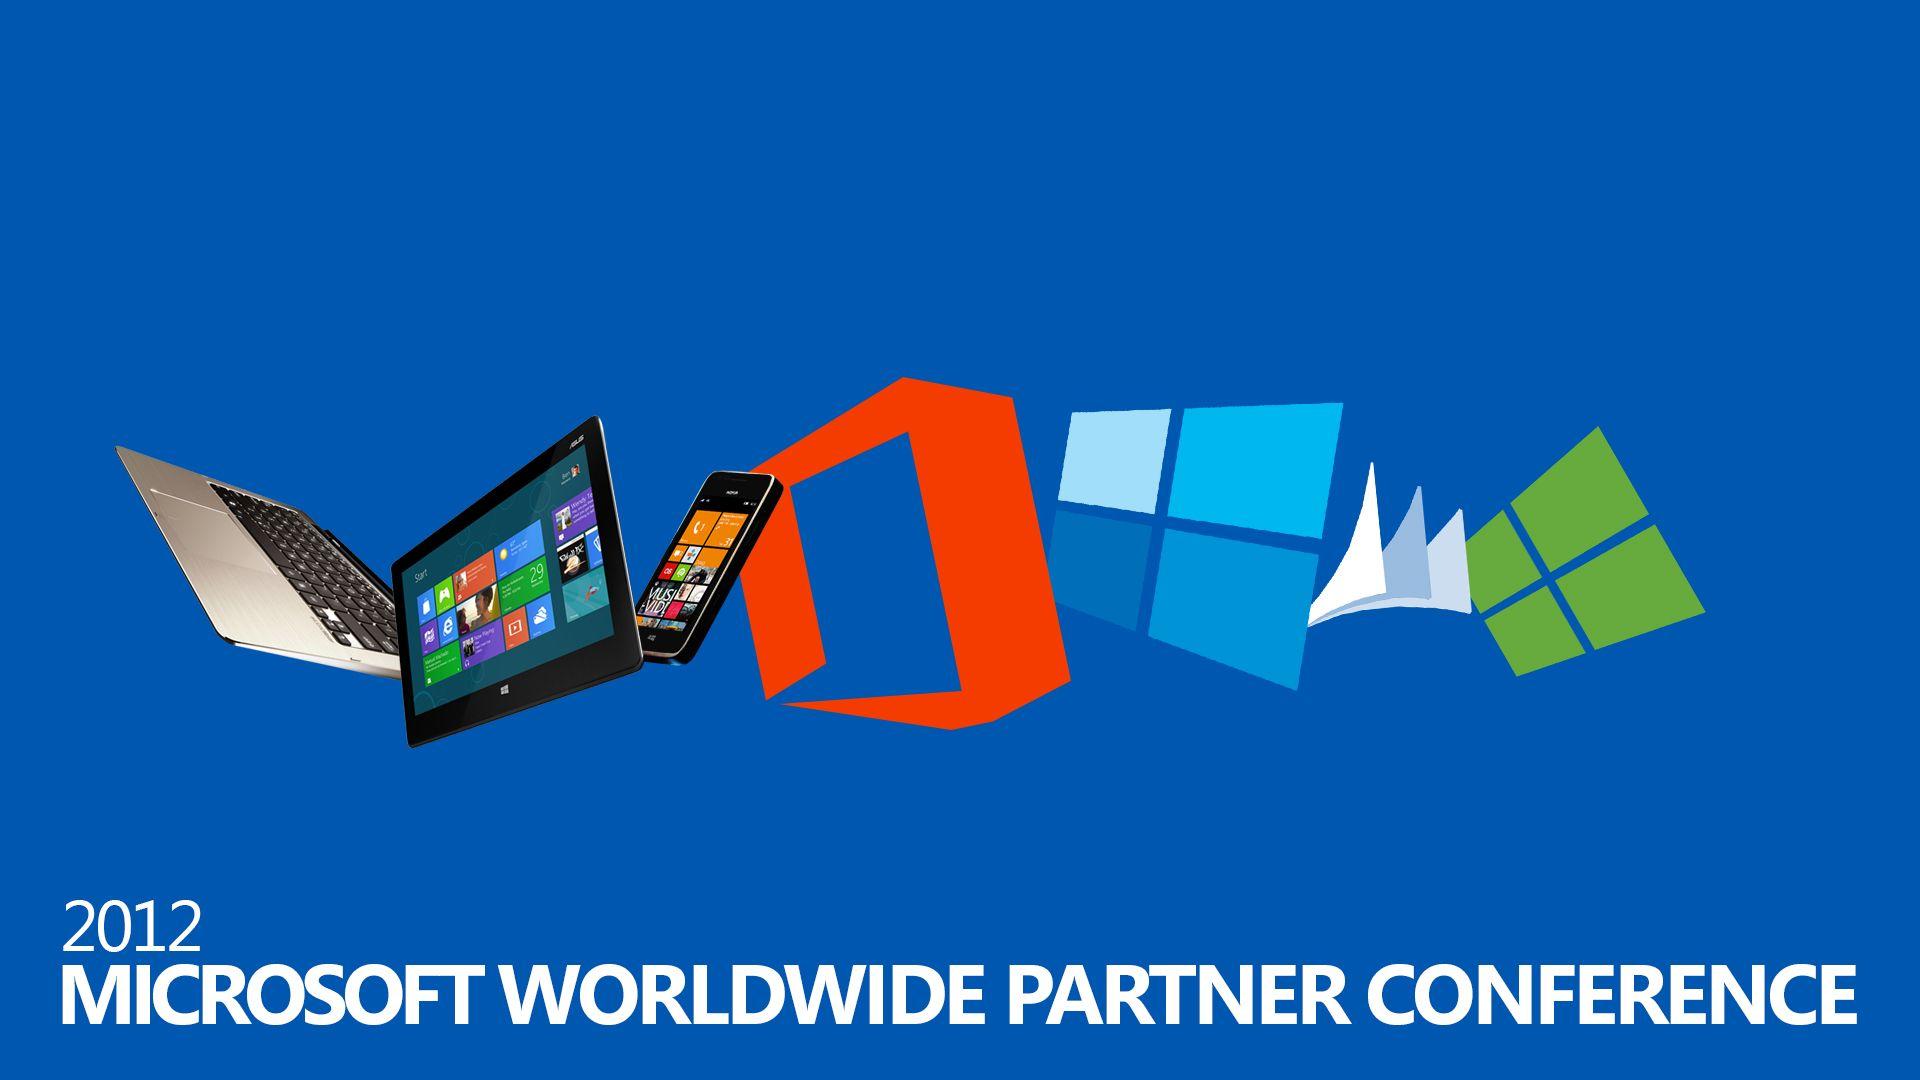 Microsoft Windows Red HD desktop wallpaper High Definition 1680